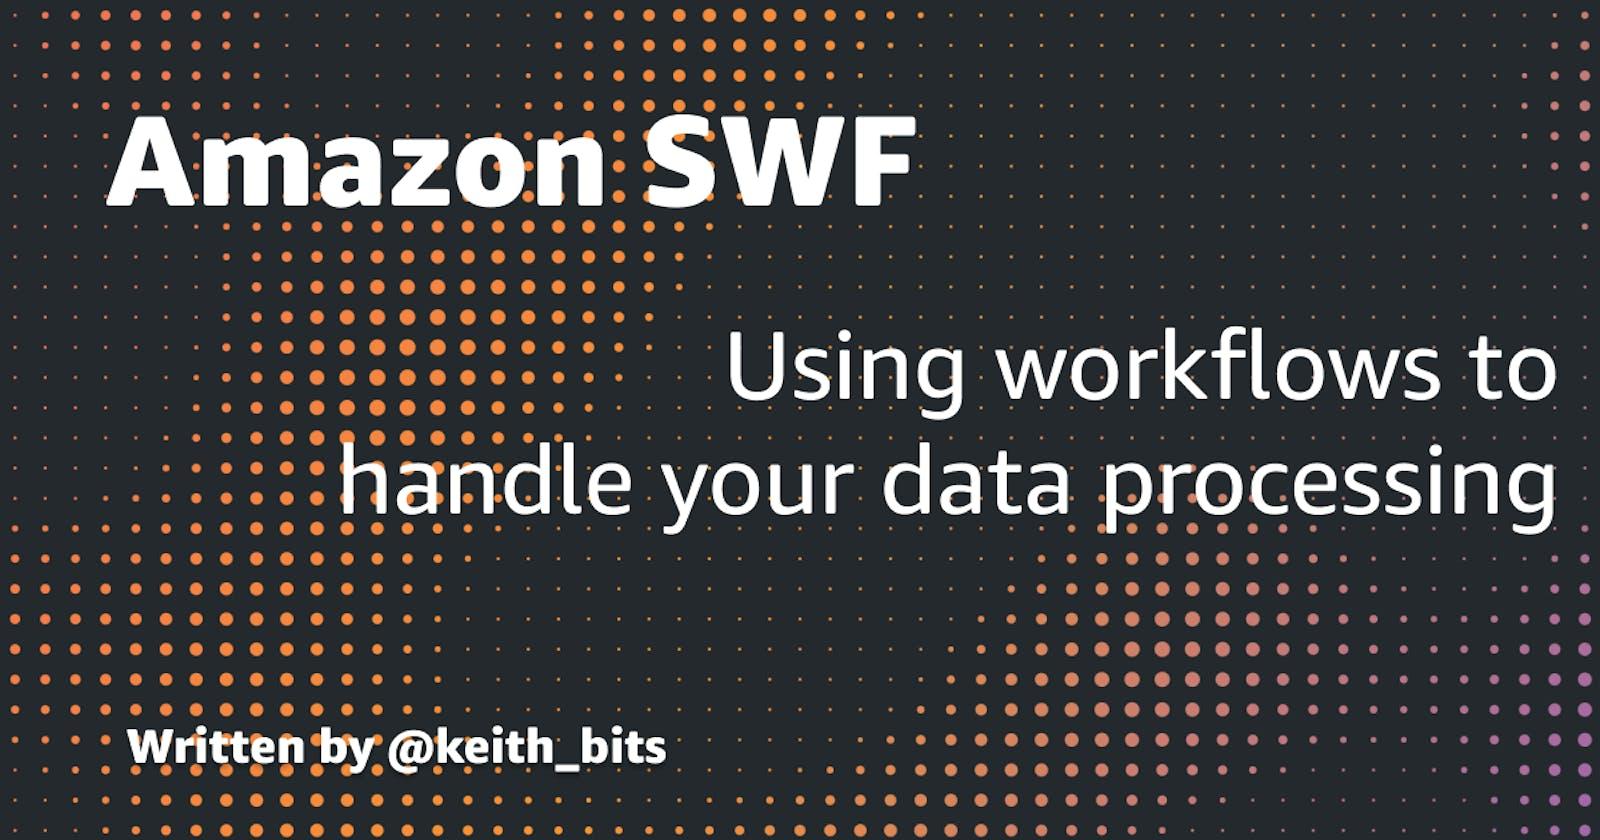 Amazon Simple Workflow Service